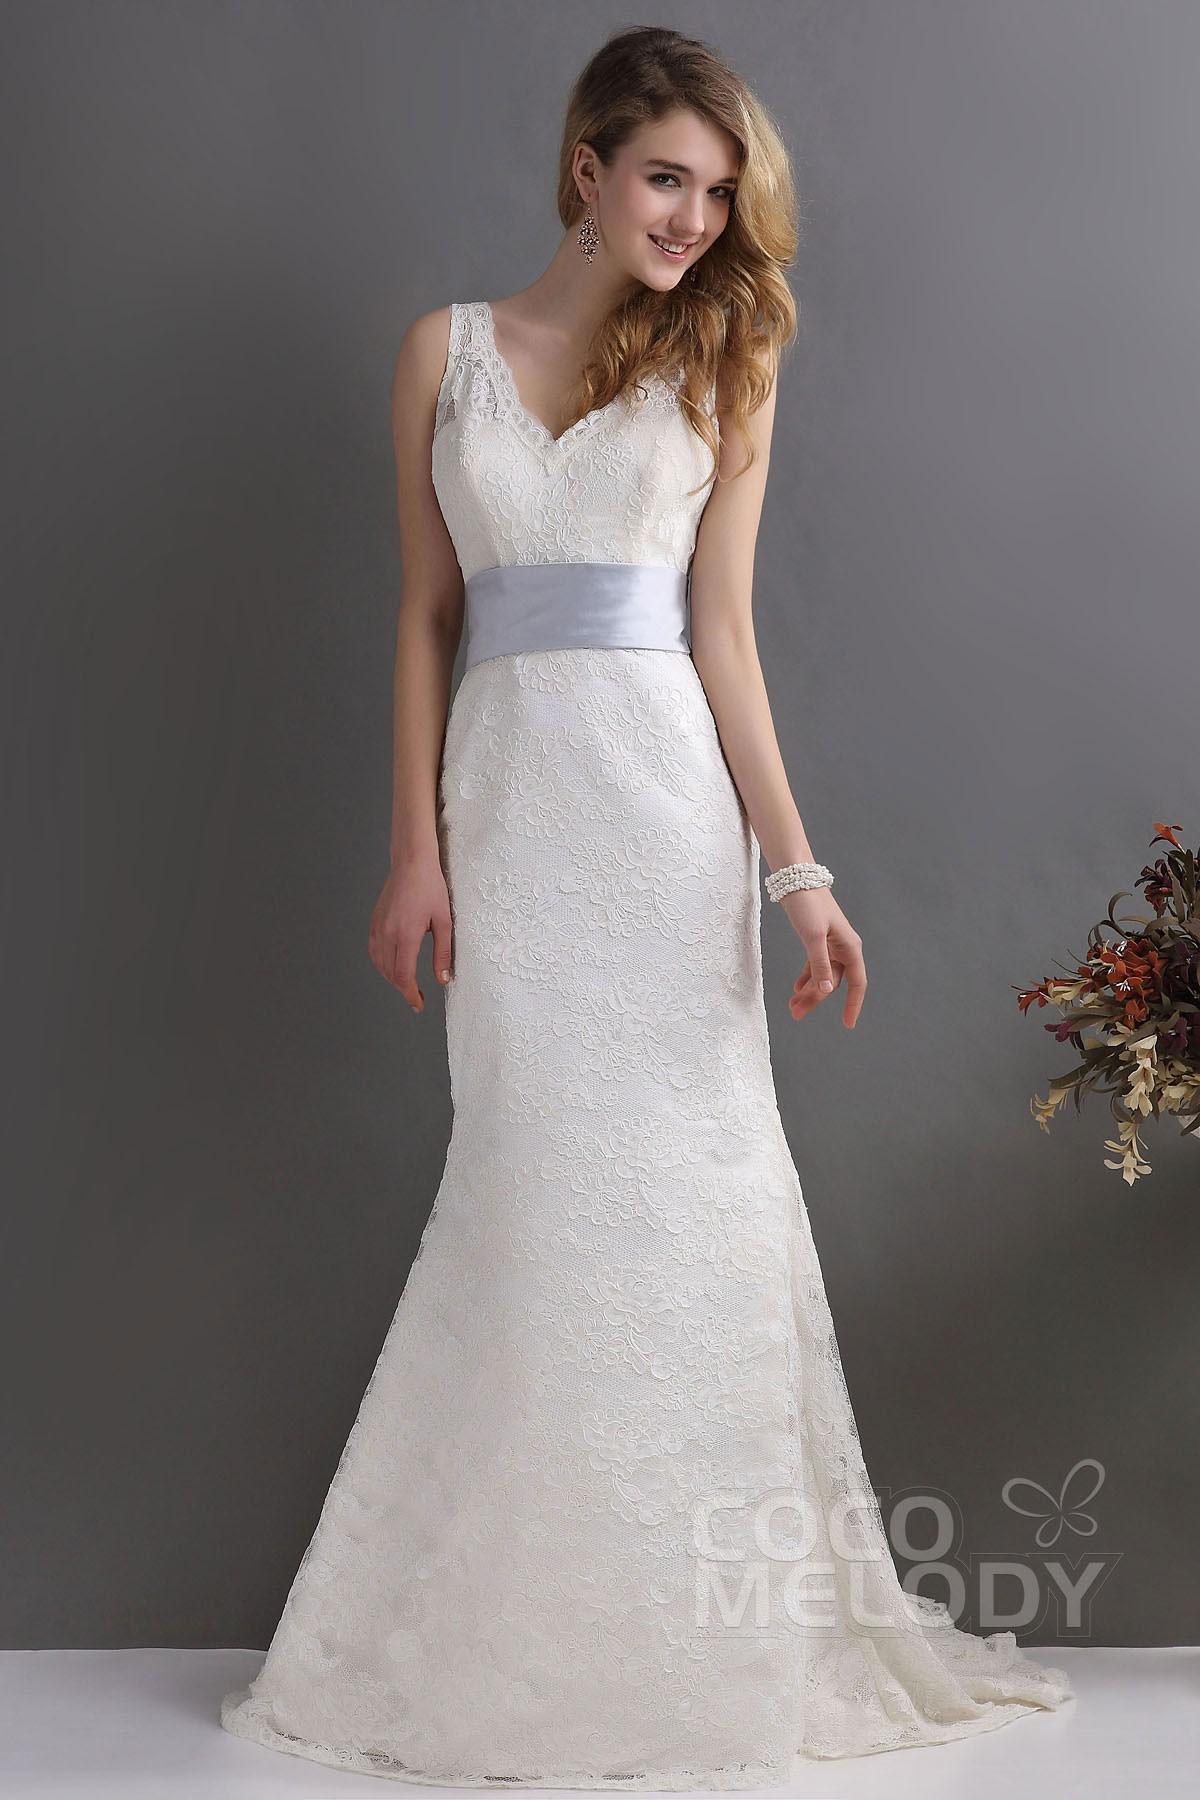 Modern Trumpet-Mermaid V-Neck Sweep-Brush Train Lace Wedding Dress CWLT130F9